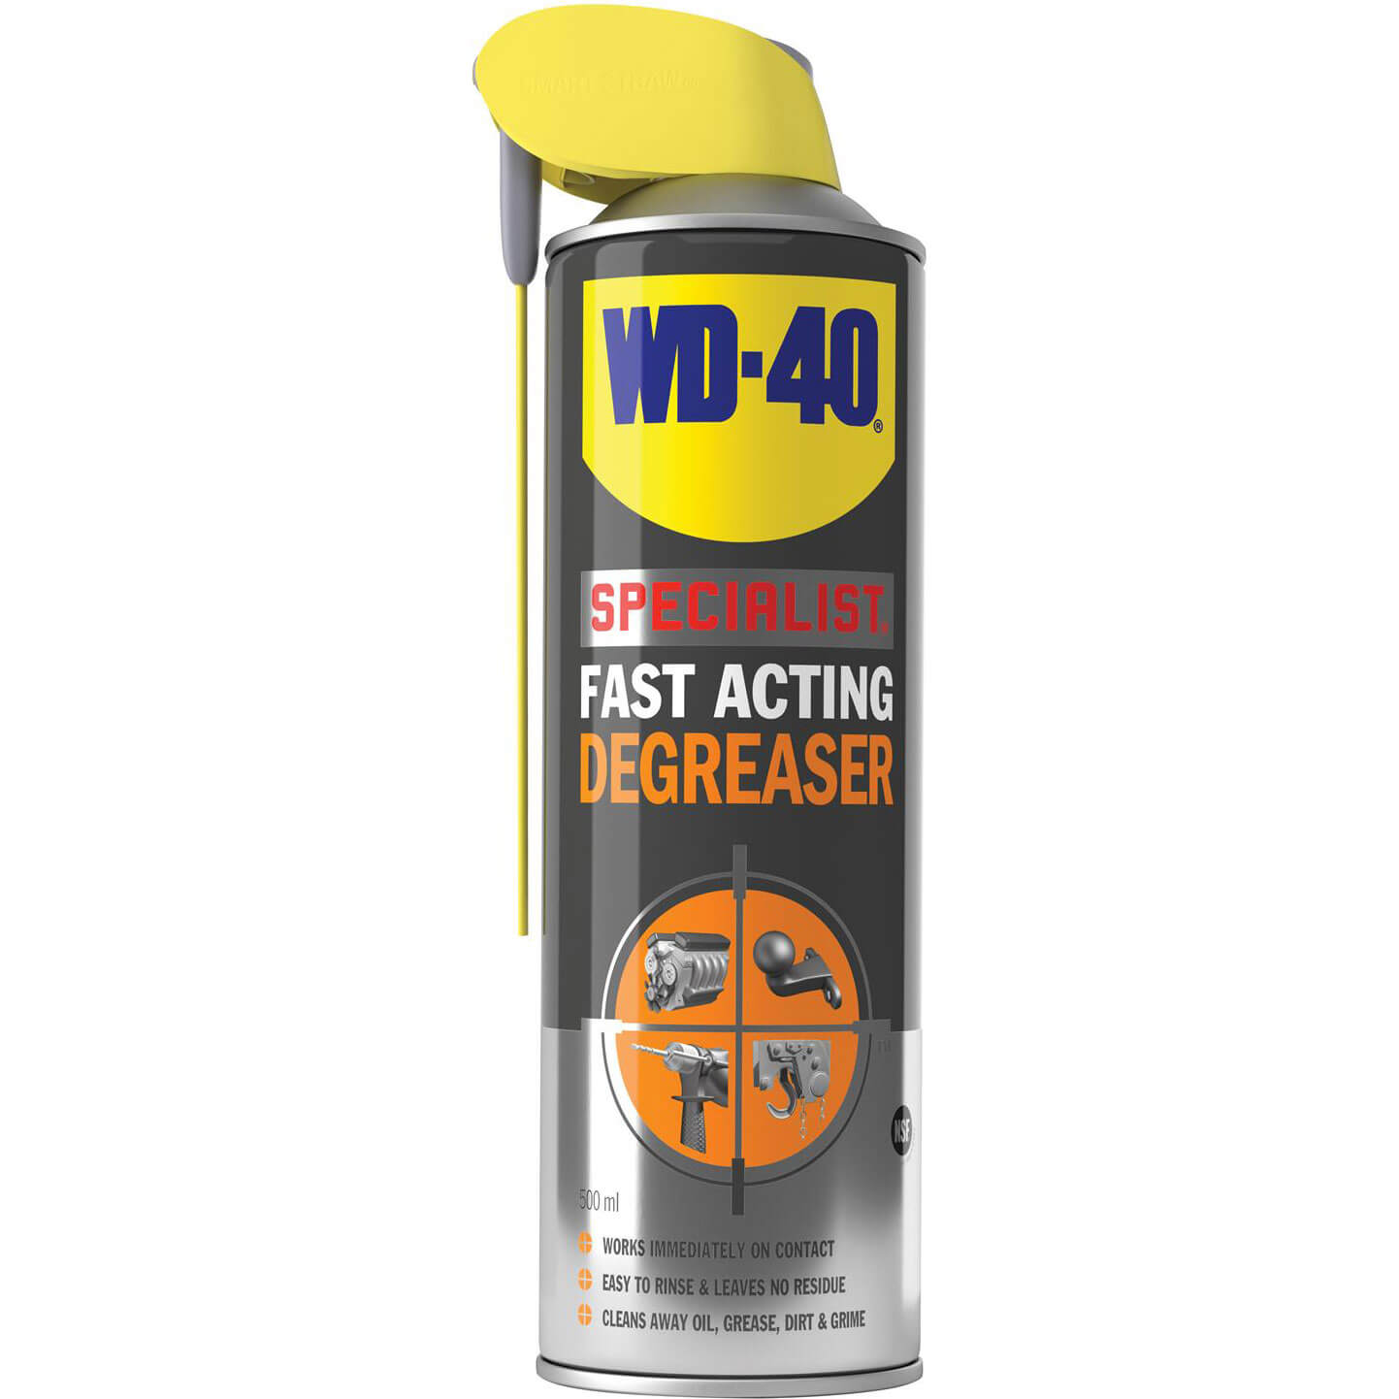 Image of WD40 Specialist Degreaser Aerosol Spray 400ml